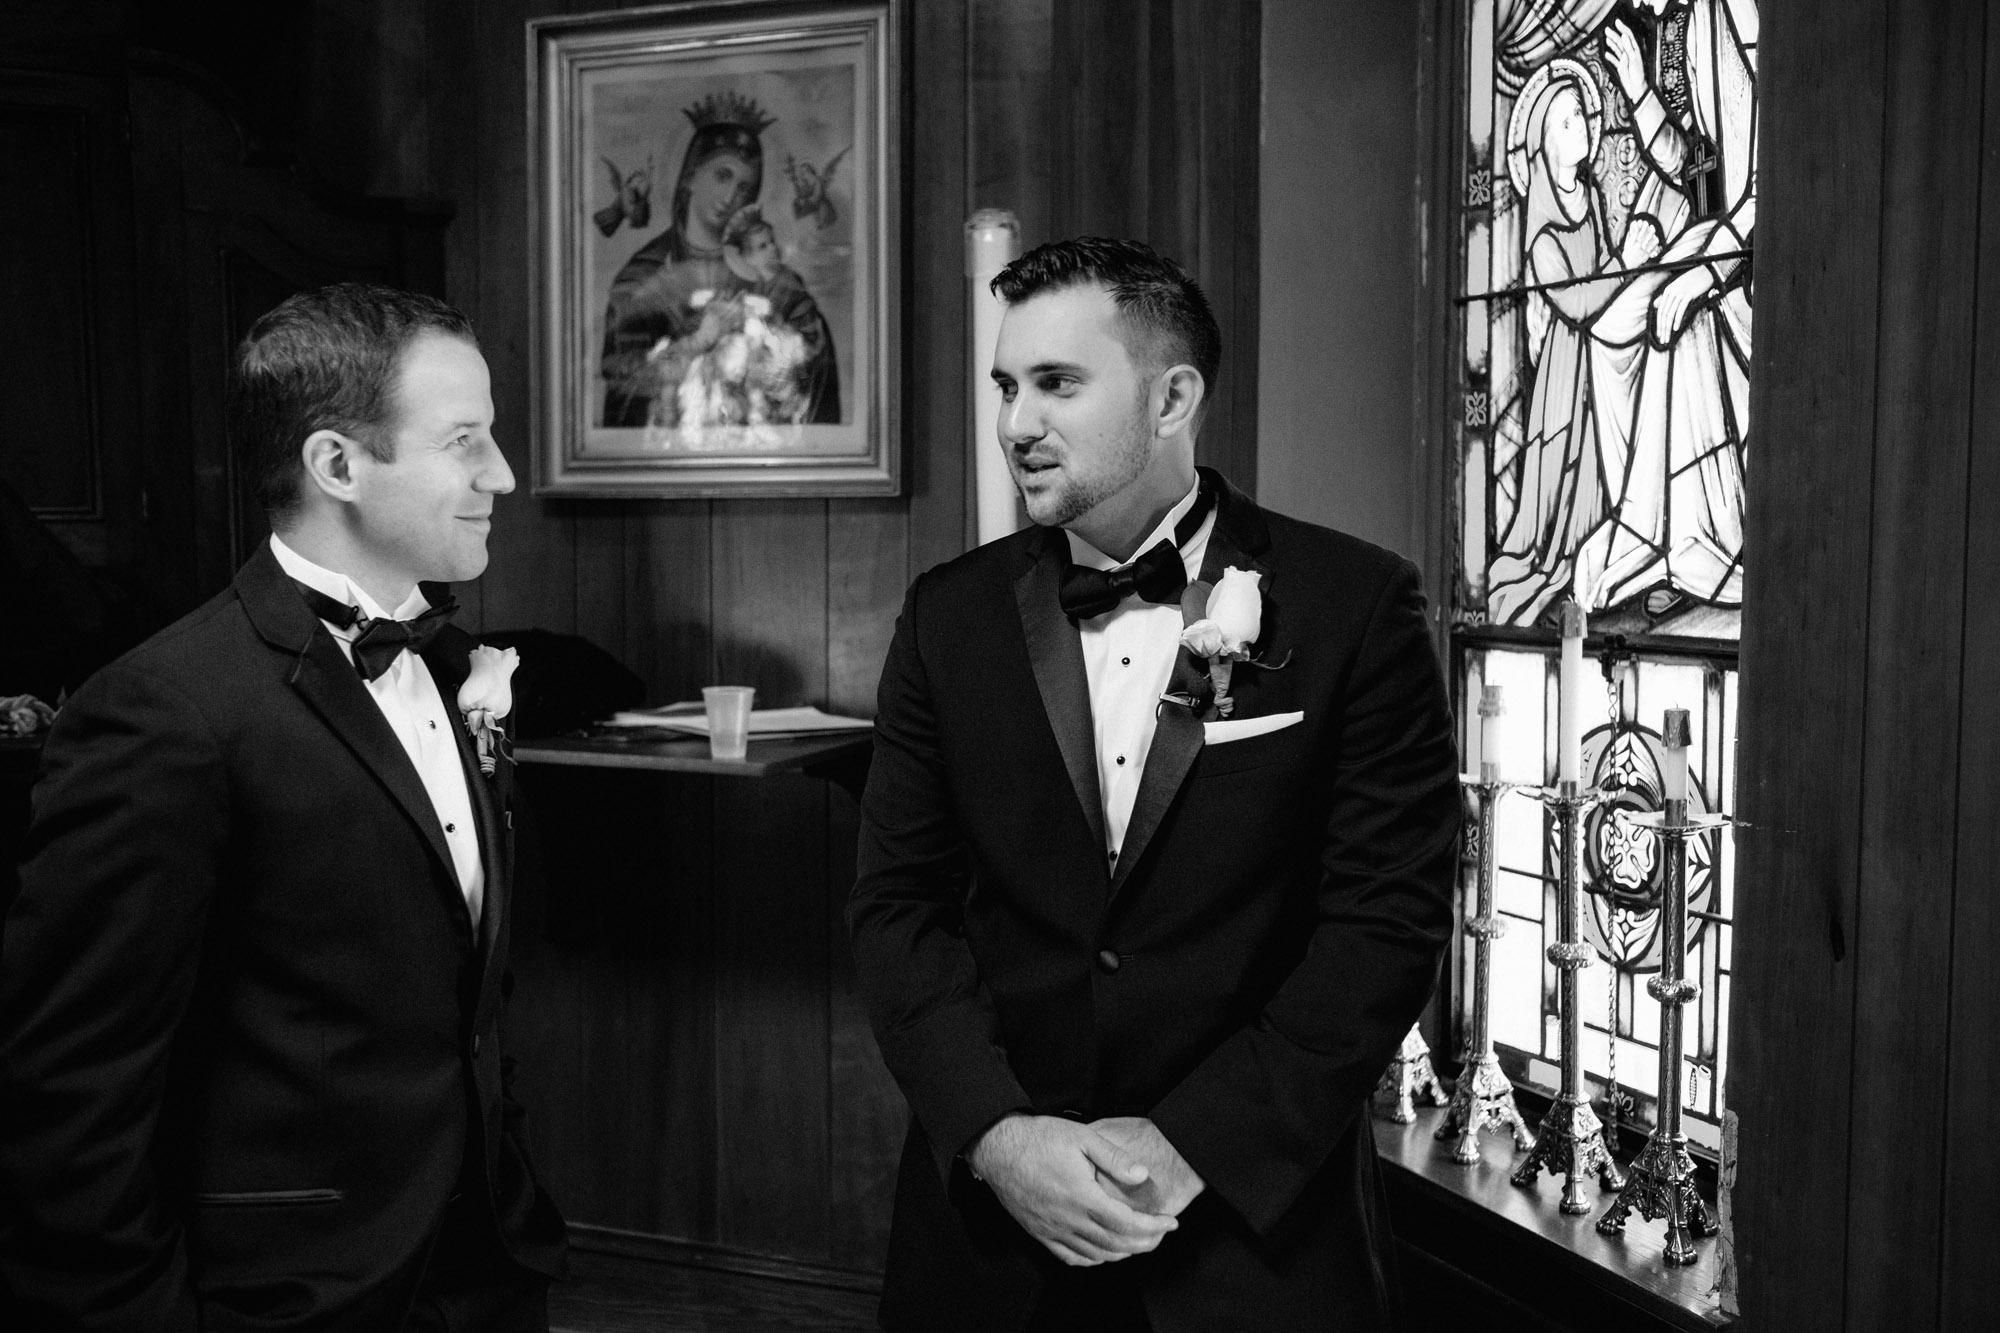 mia-josh-scranton-wedding-photography-026